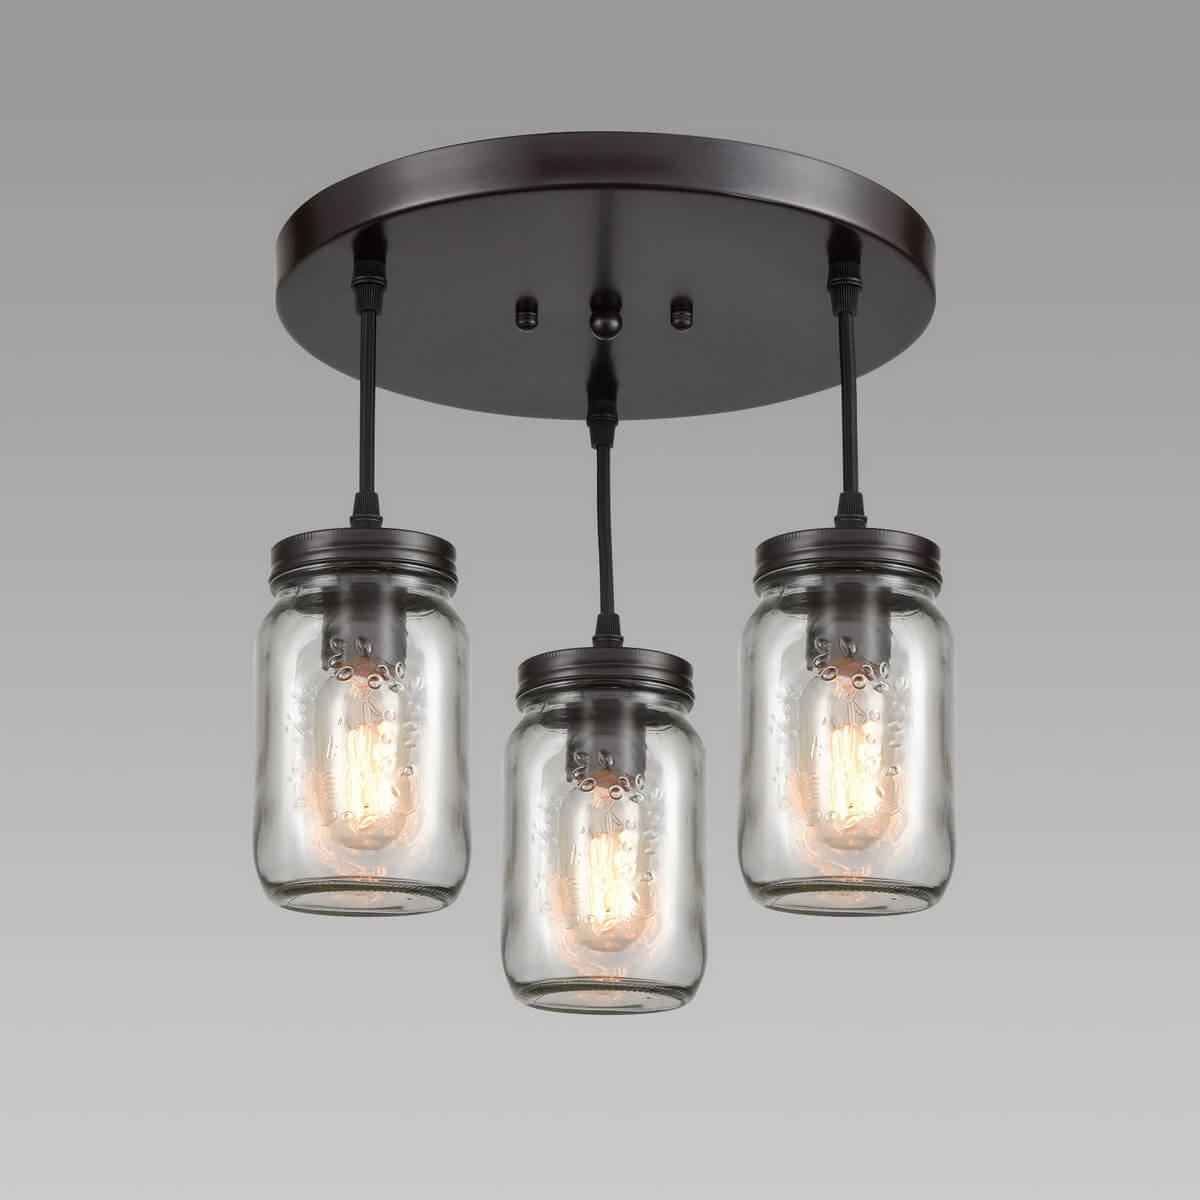 Industrial Mason Jar Semi Flush Ceiling Light Bronze Finish 3-Light